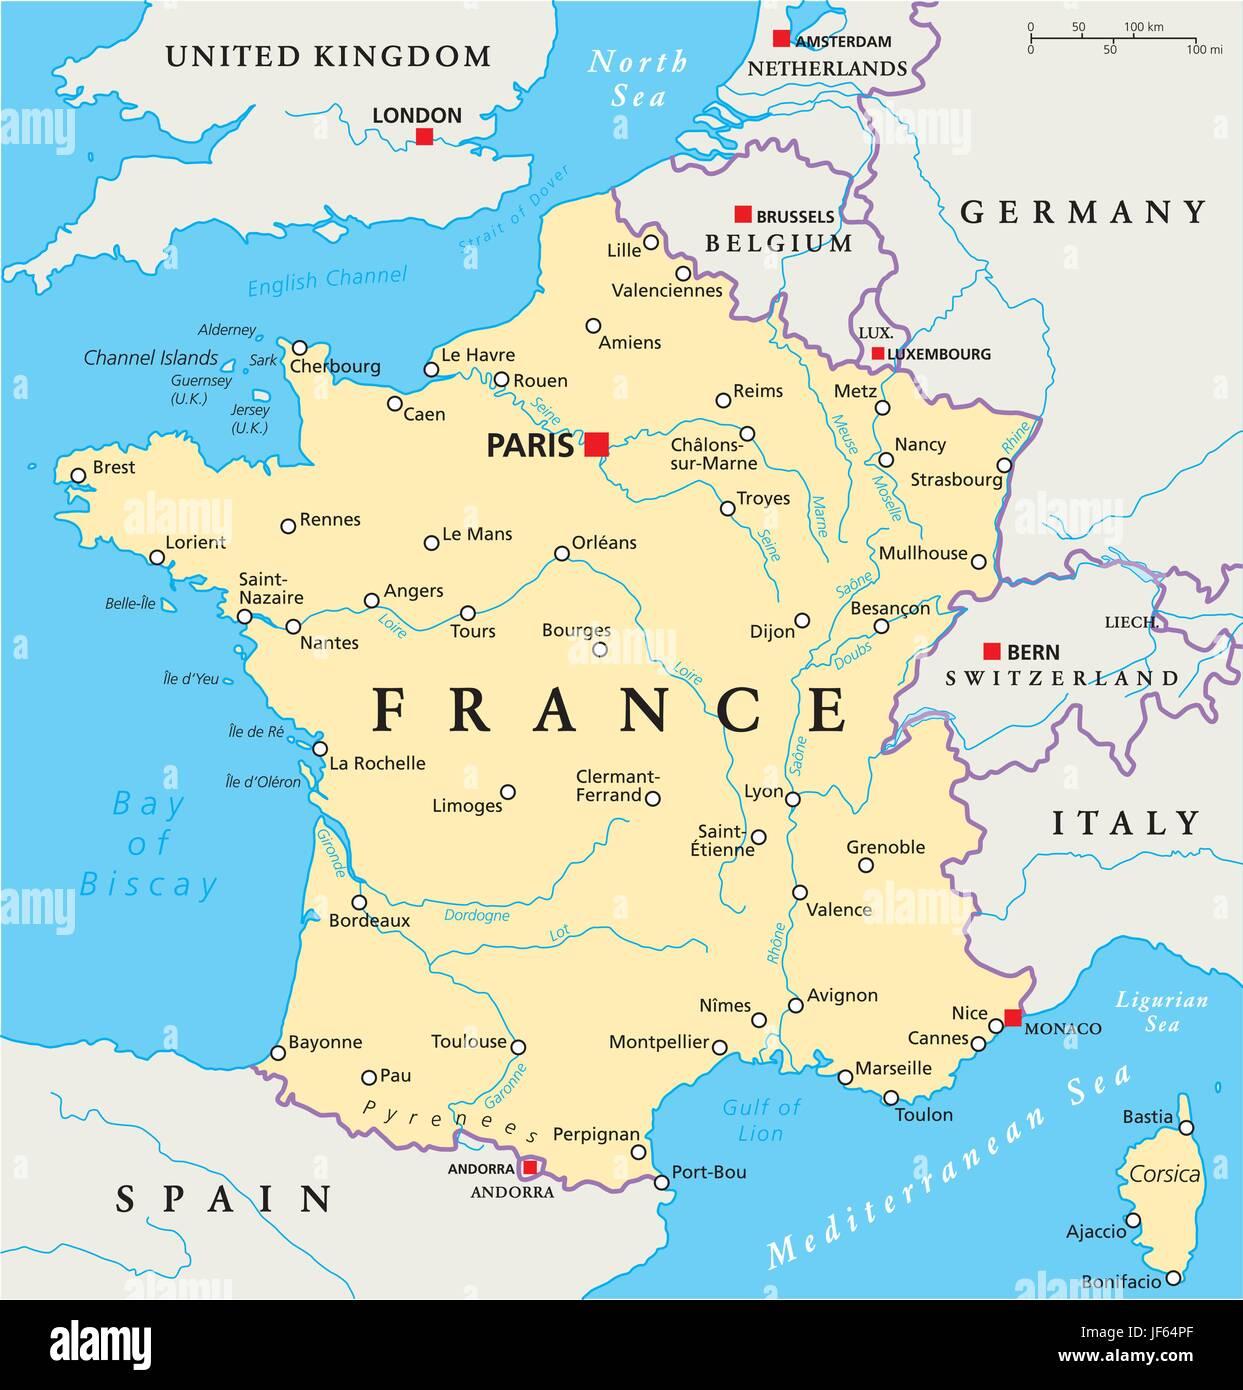 Paris france corsica map atlas map of the world political paris france corsica map atlas map of the world political water north sciox Gallery